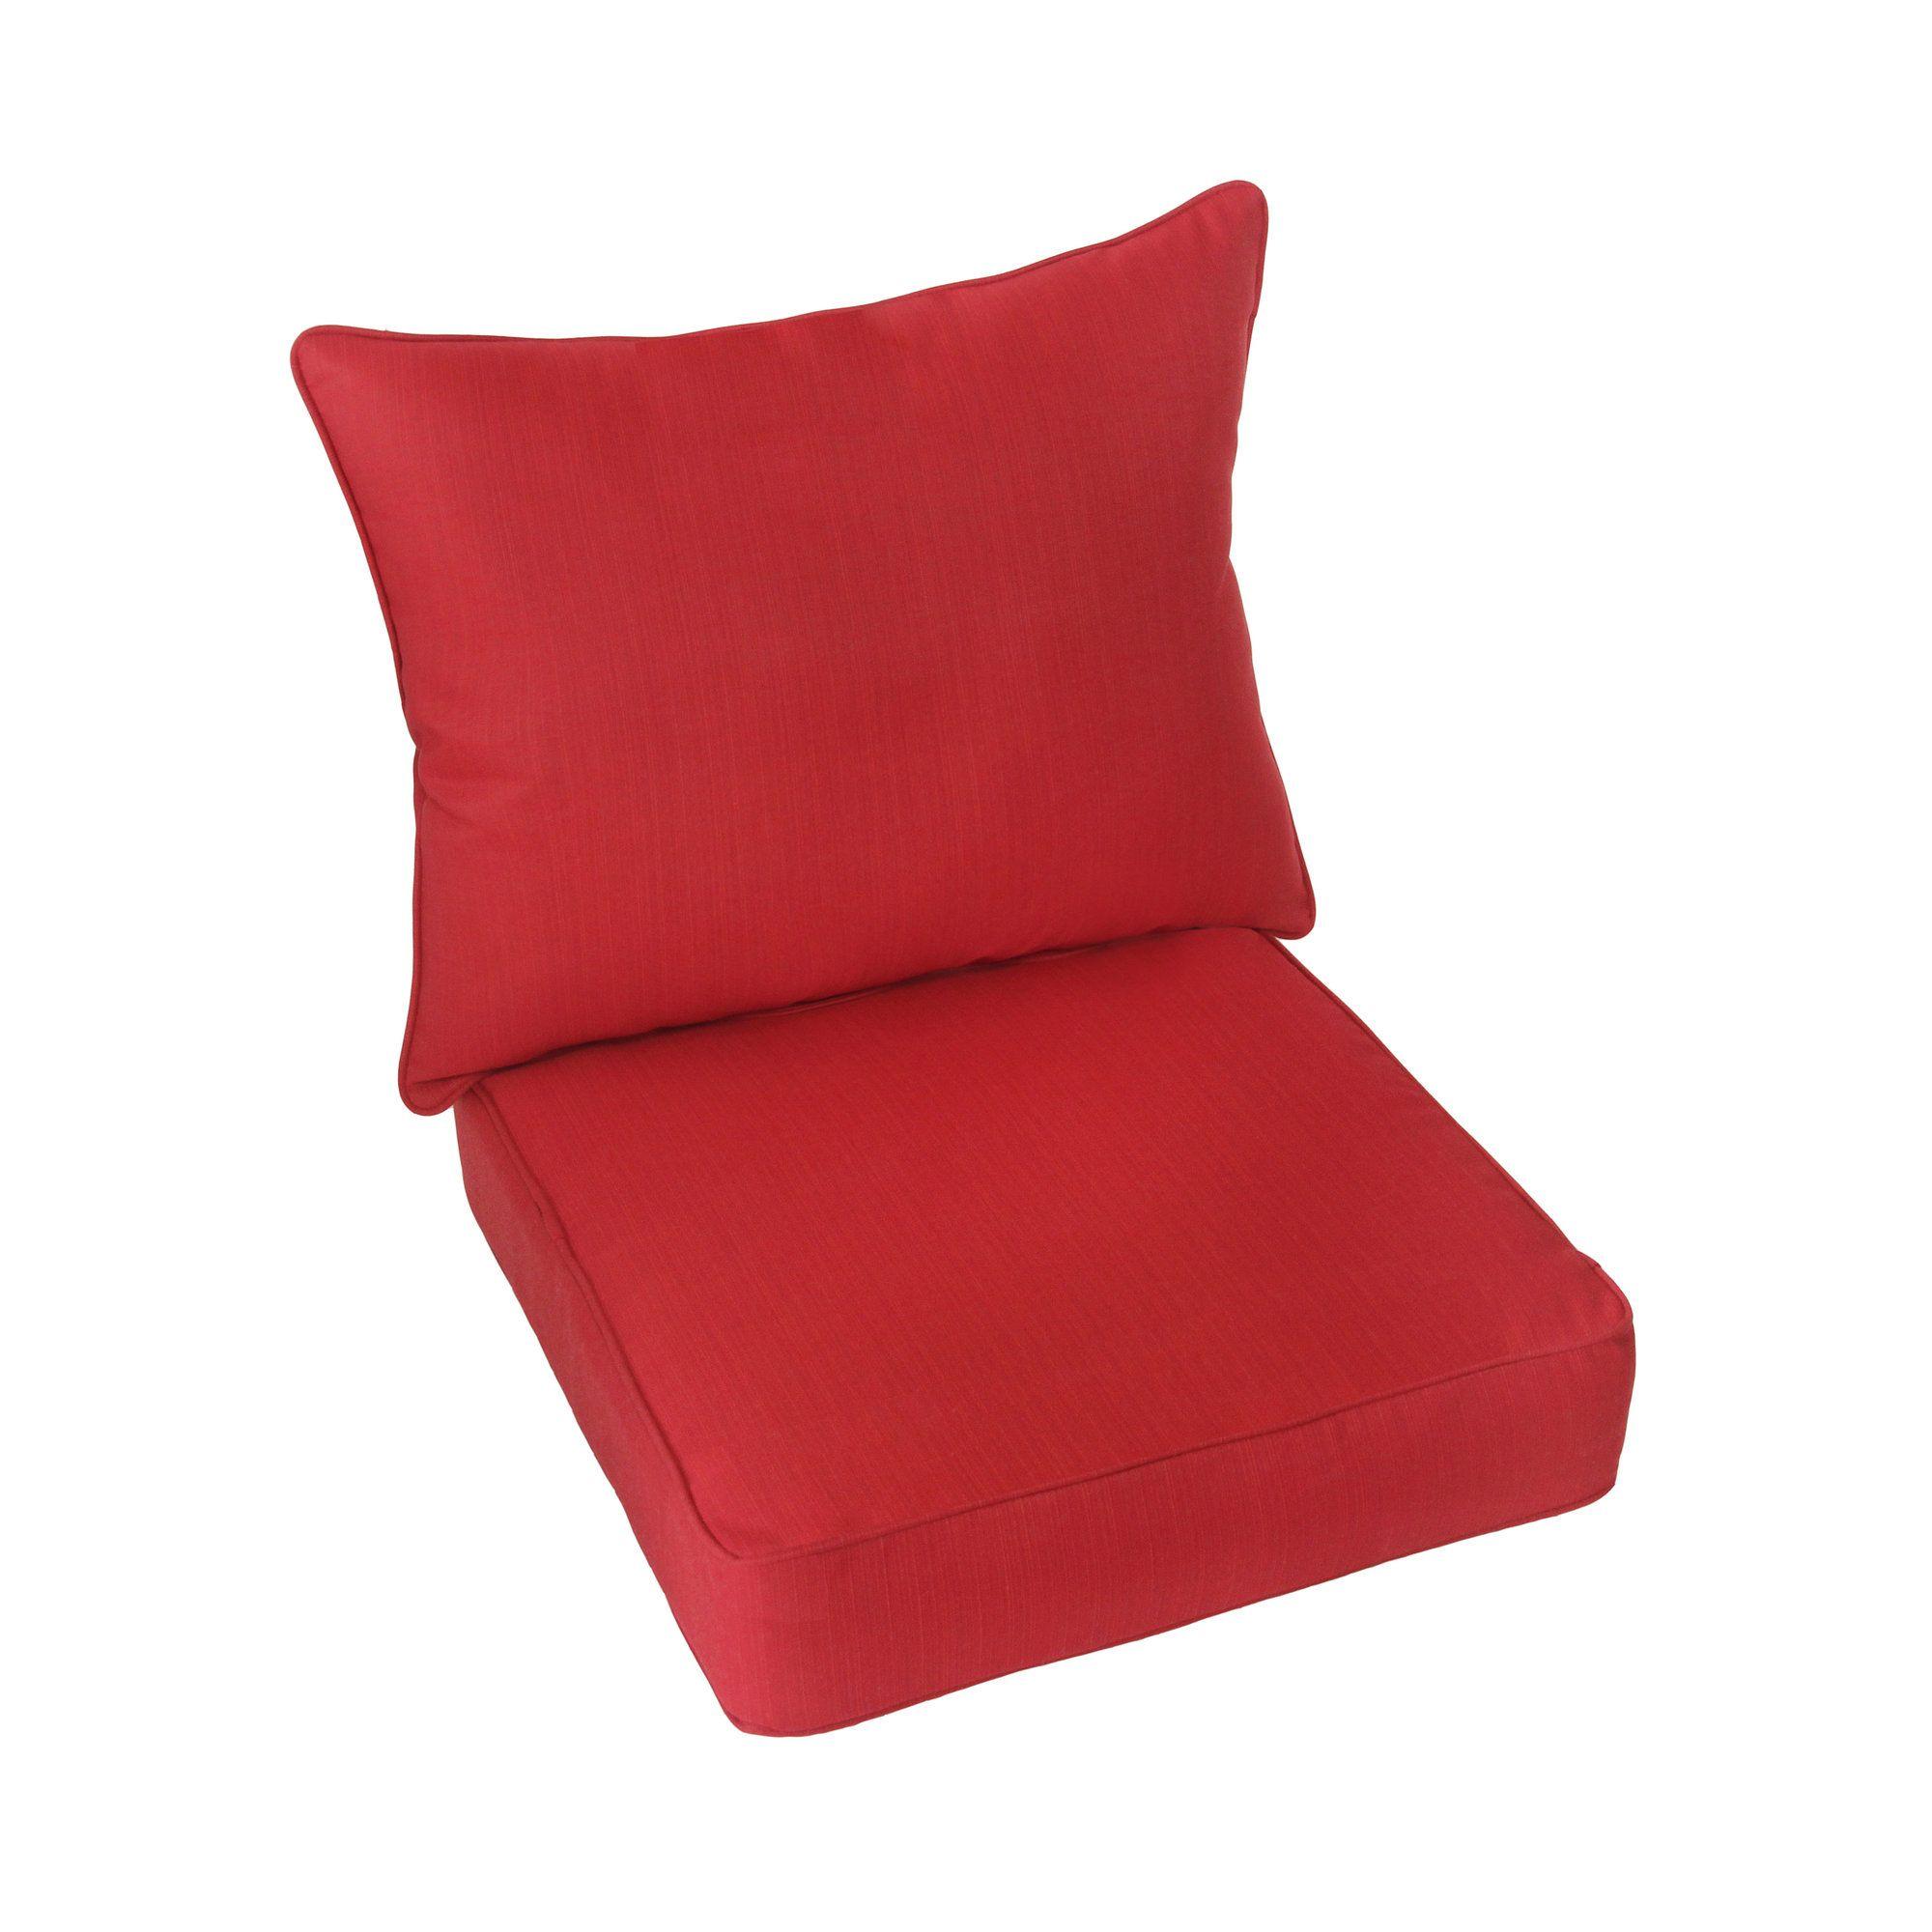 Textured Indoor Outdoor Sunbrella Lounge Chair Cushion Set